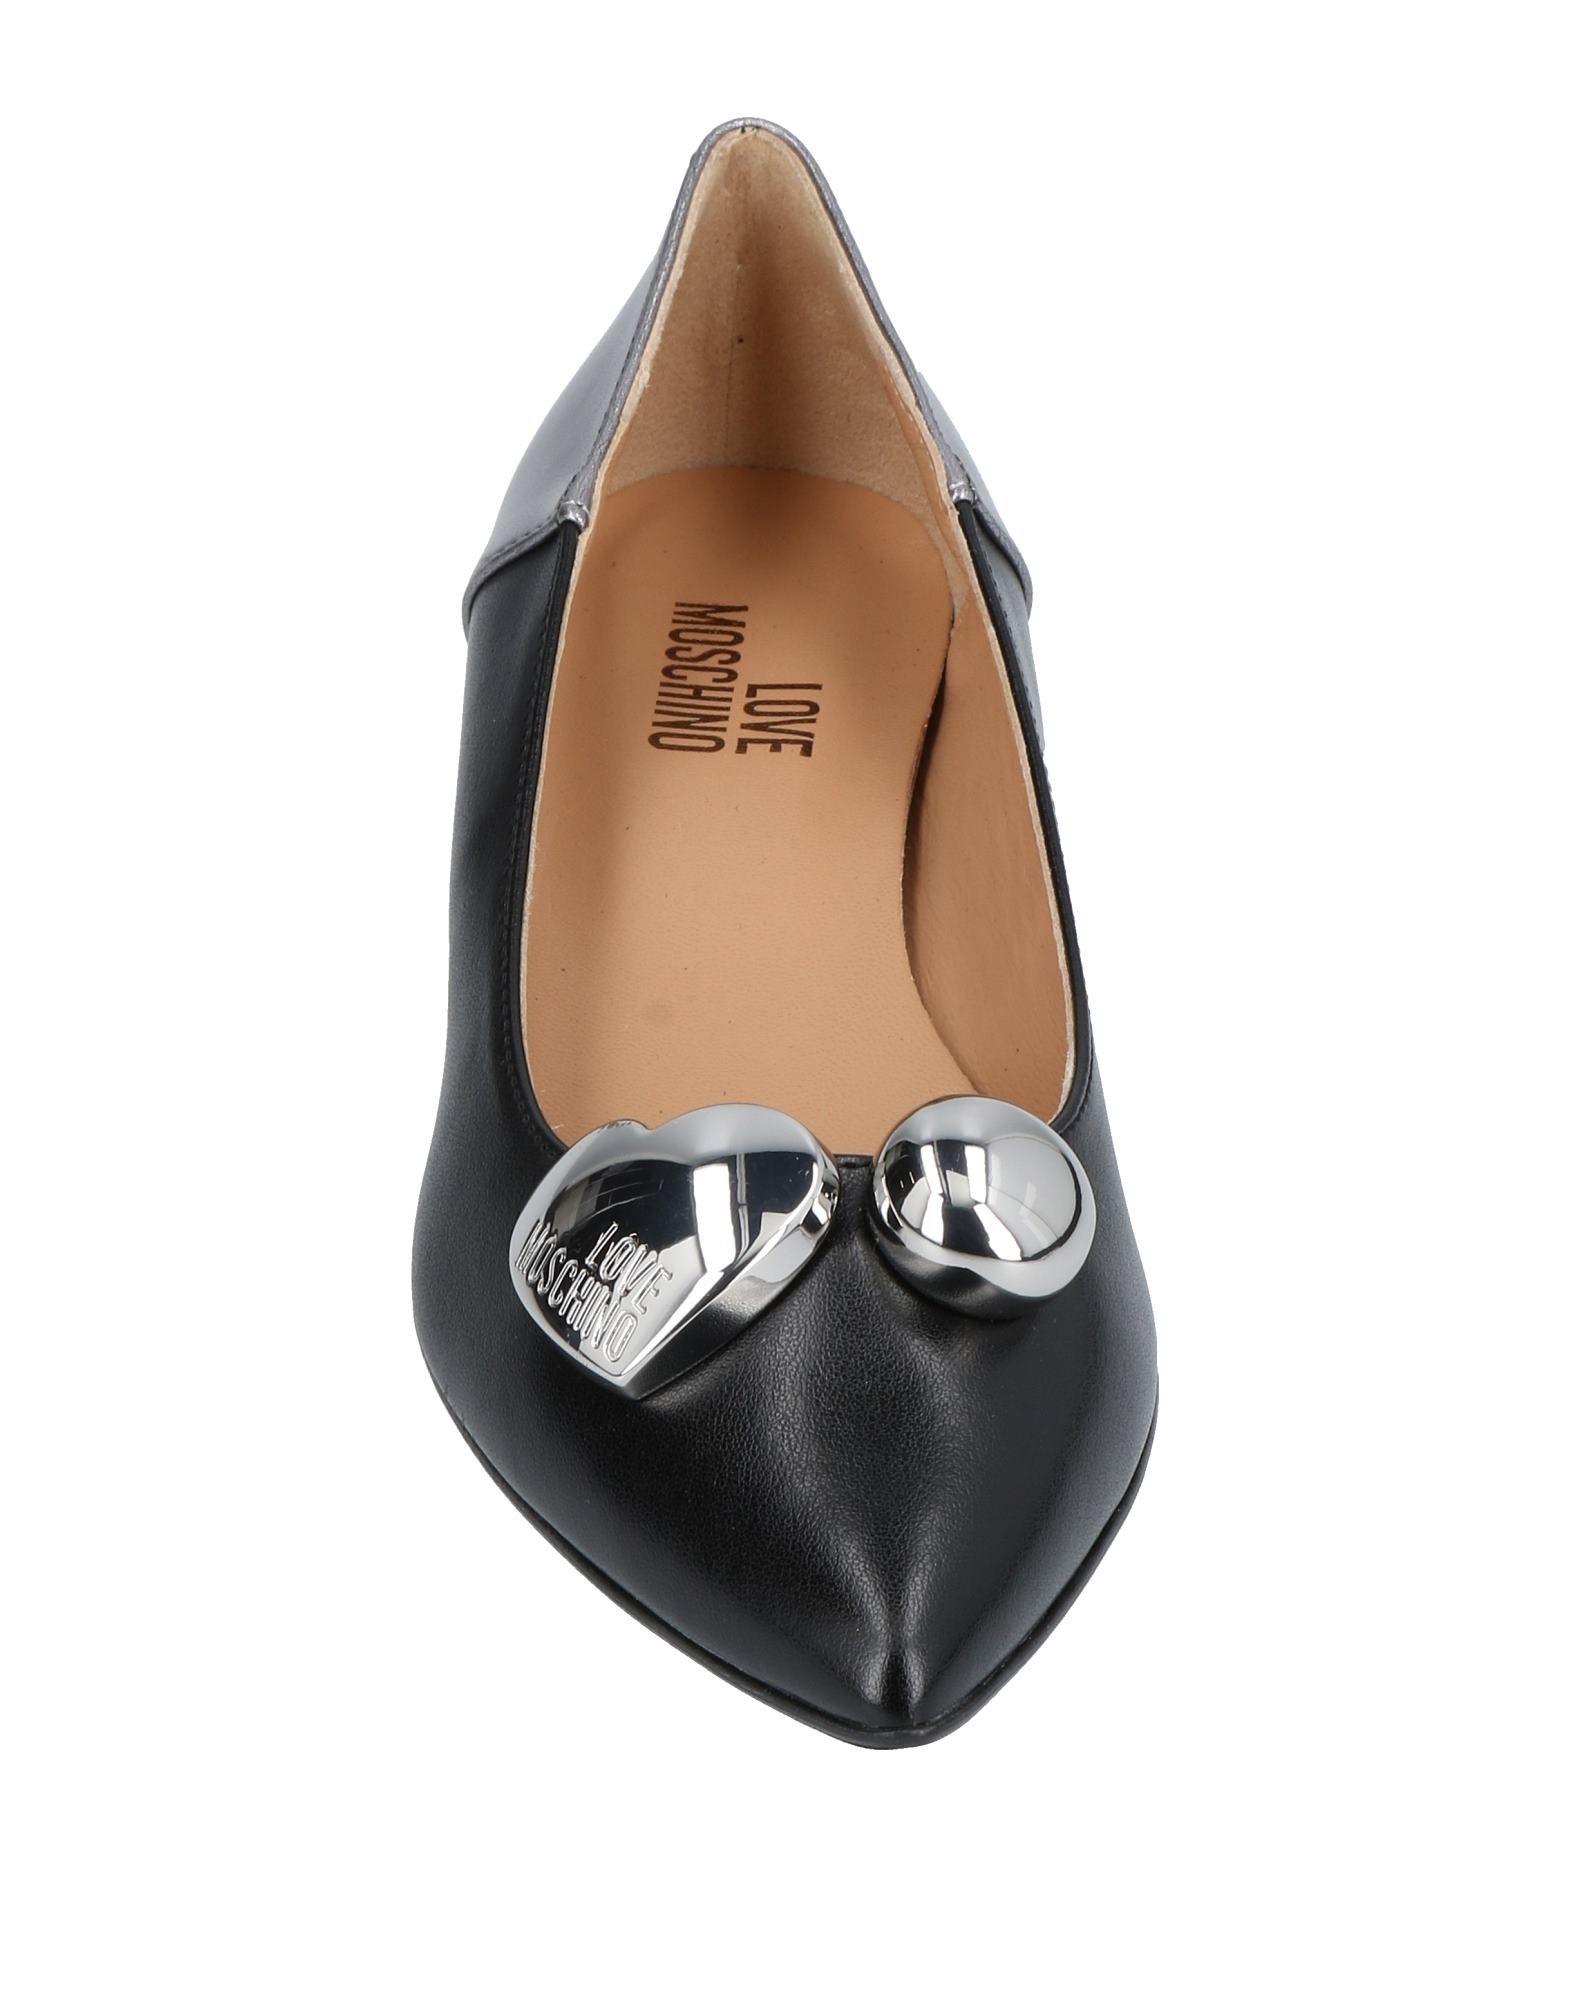 Stilvolle Schuhe billige Schuhe Stilvolle Love Moschino Ballerinas Damen  11451185OG 0804f3